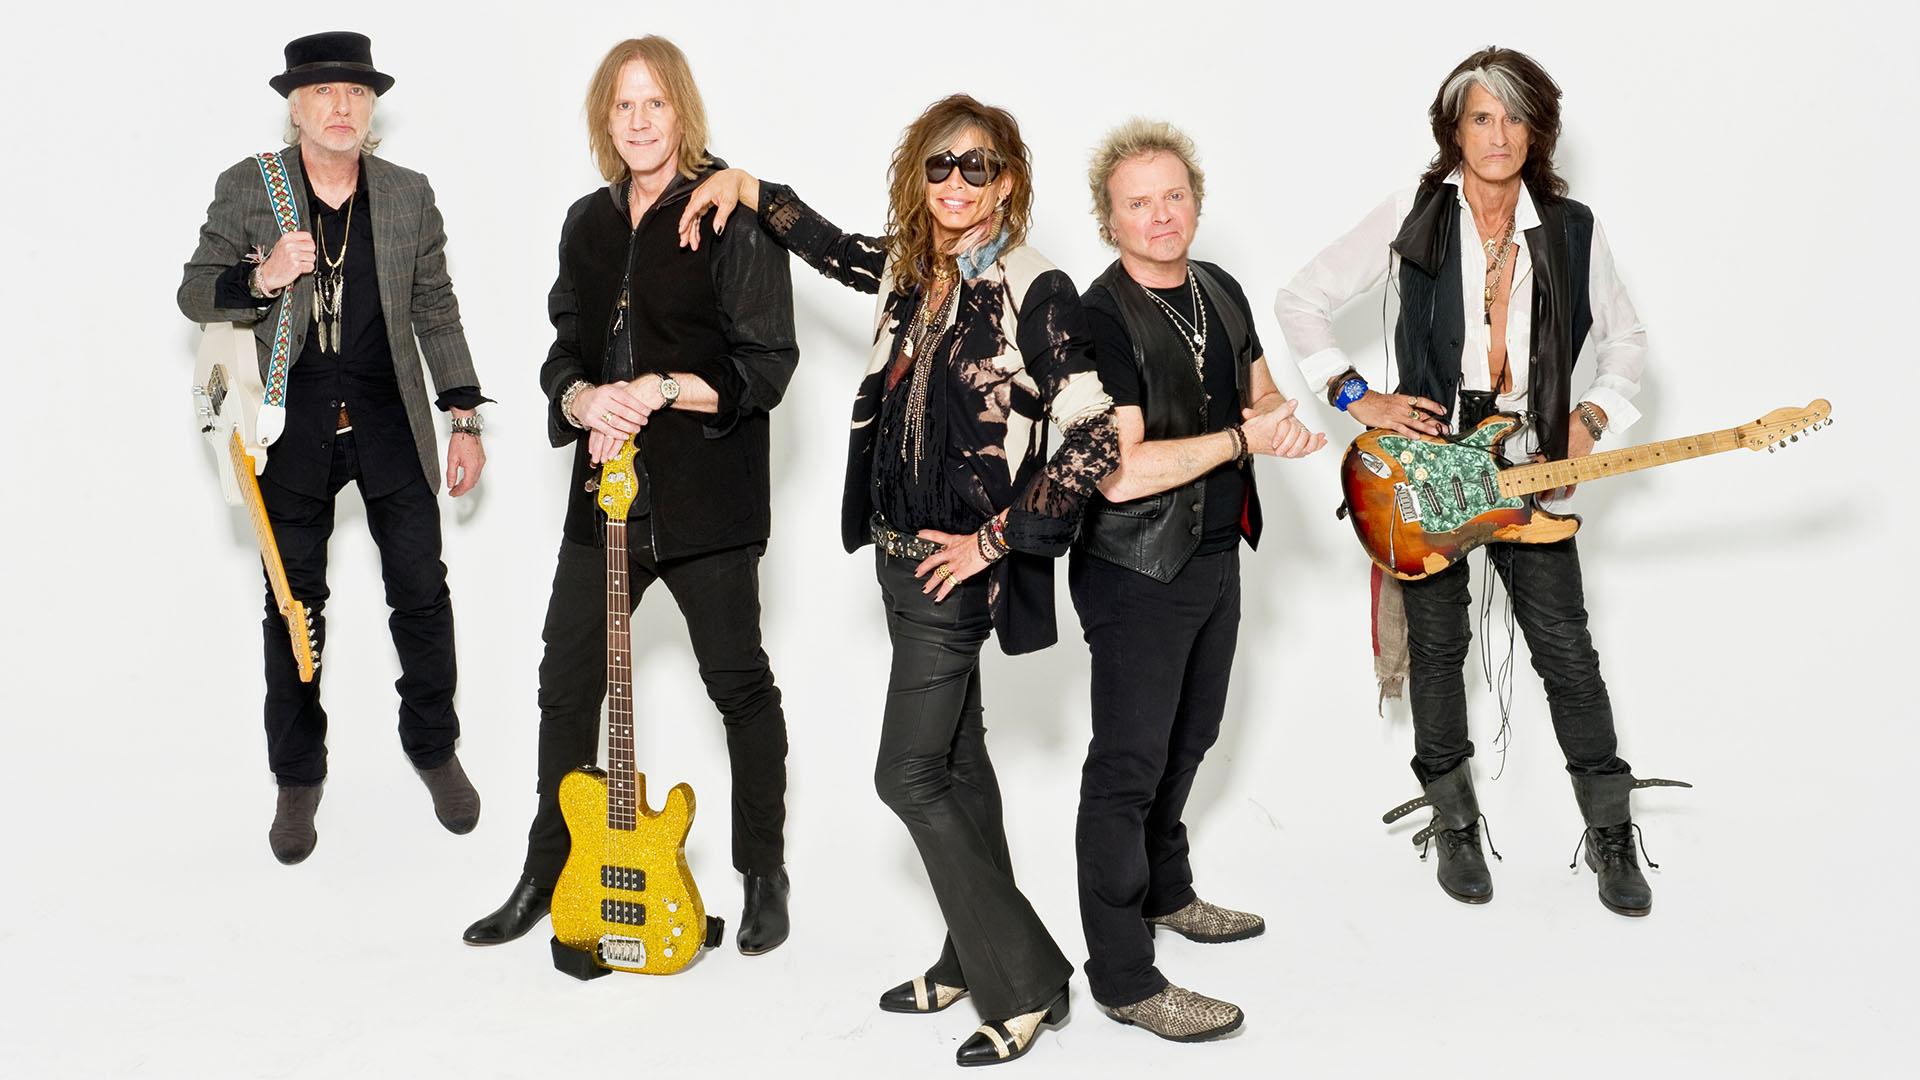 Aerosmith 2013 - 1920x1080